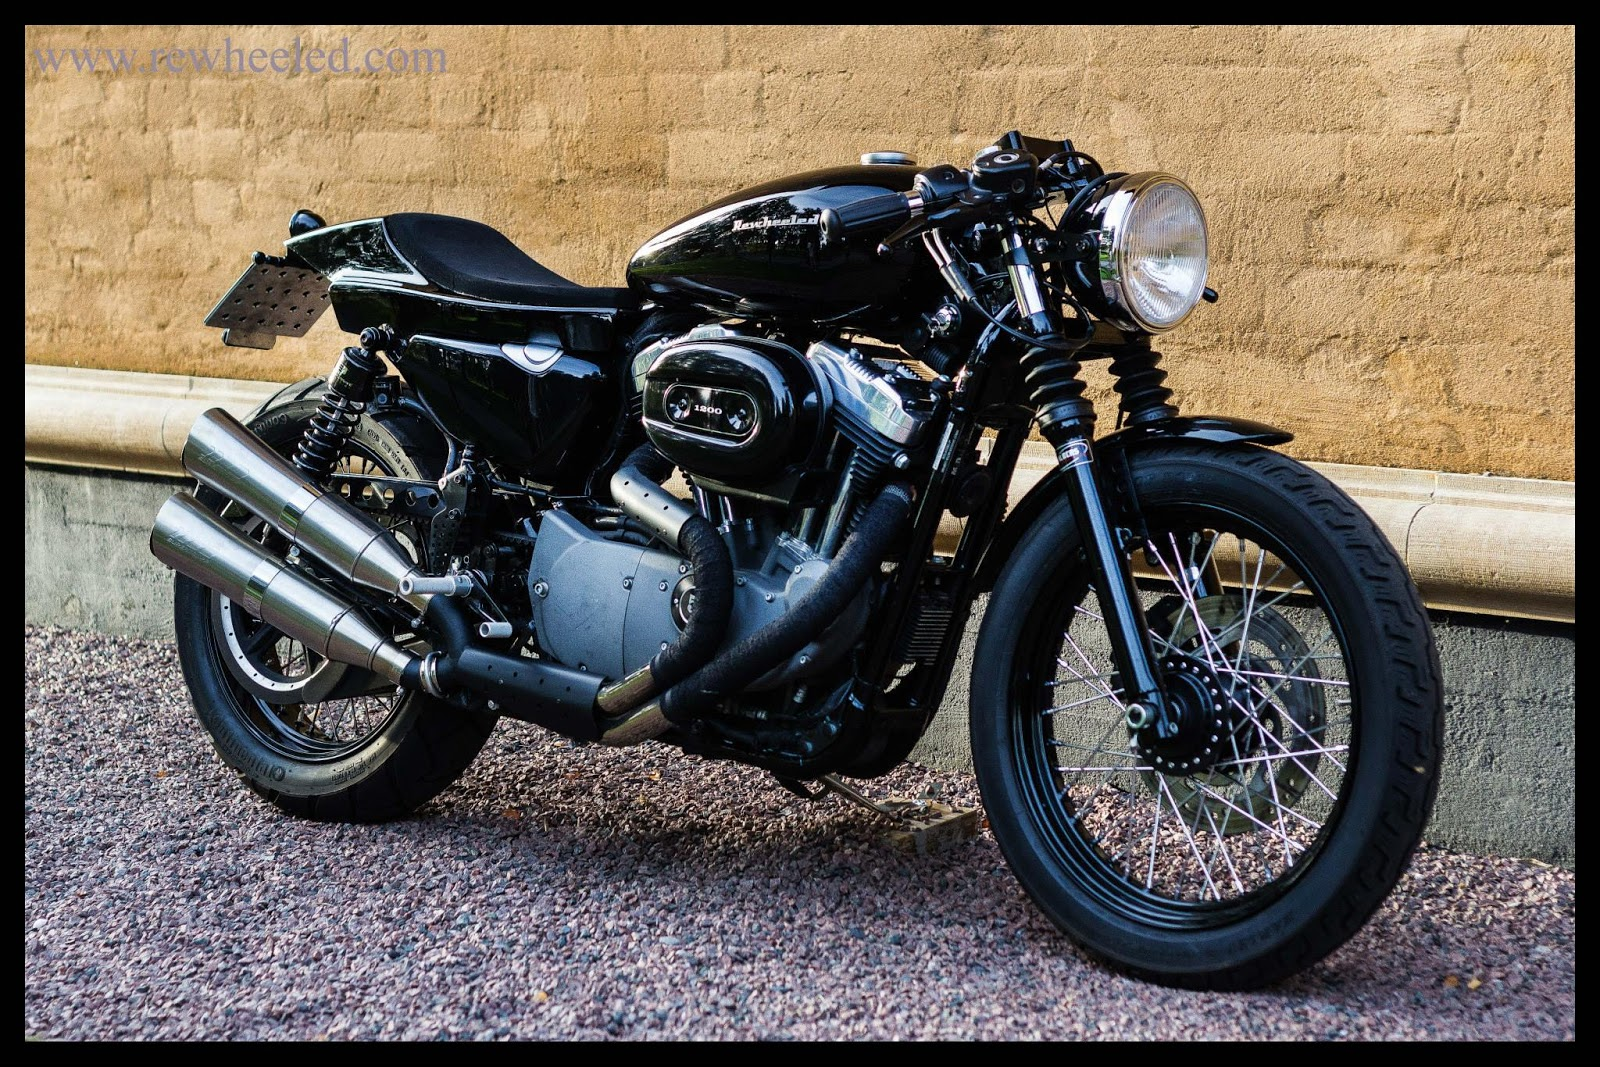 Harley+Nightster+Cafe+racer+by+RE-Cycles+Bikes+Rewheeled+AB+10.jpg